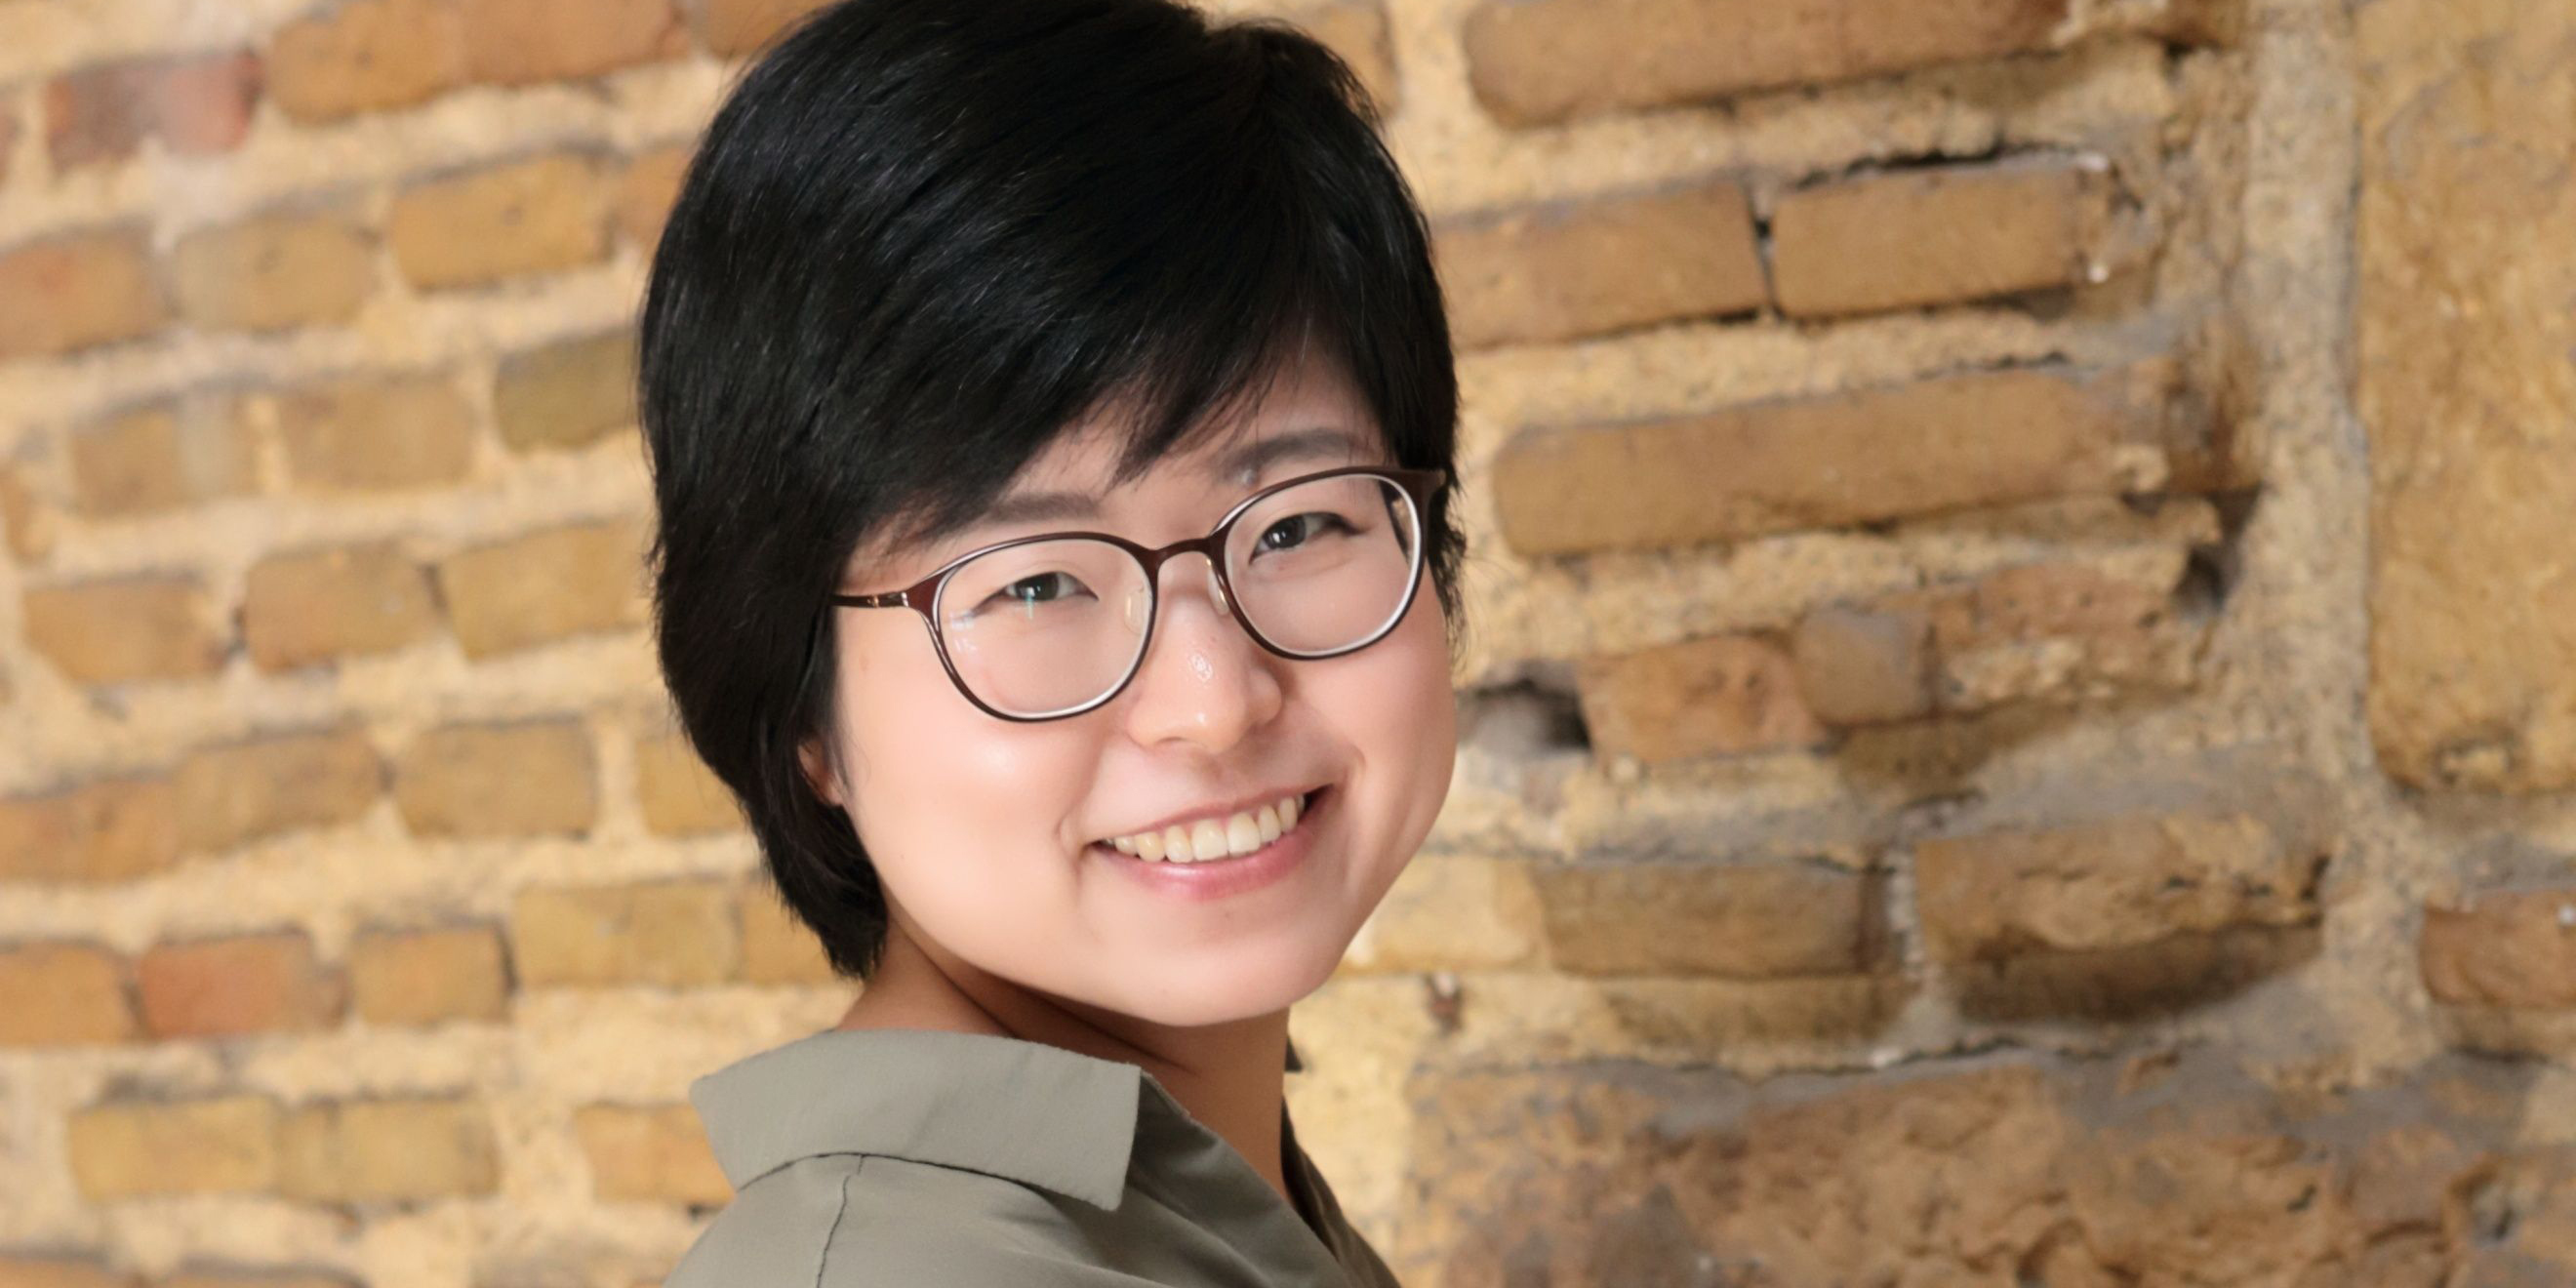 Lynn Fu, China, participant in the GCLP 2017 edition